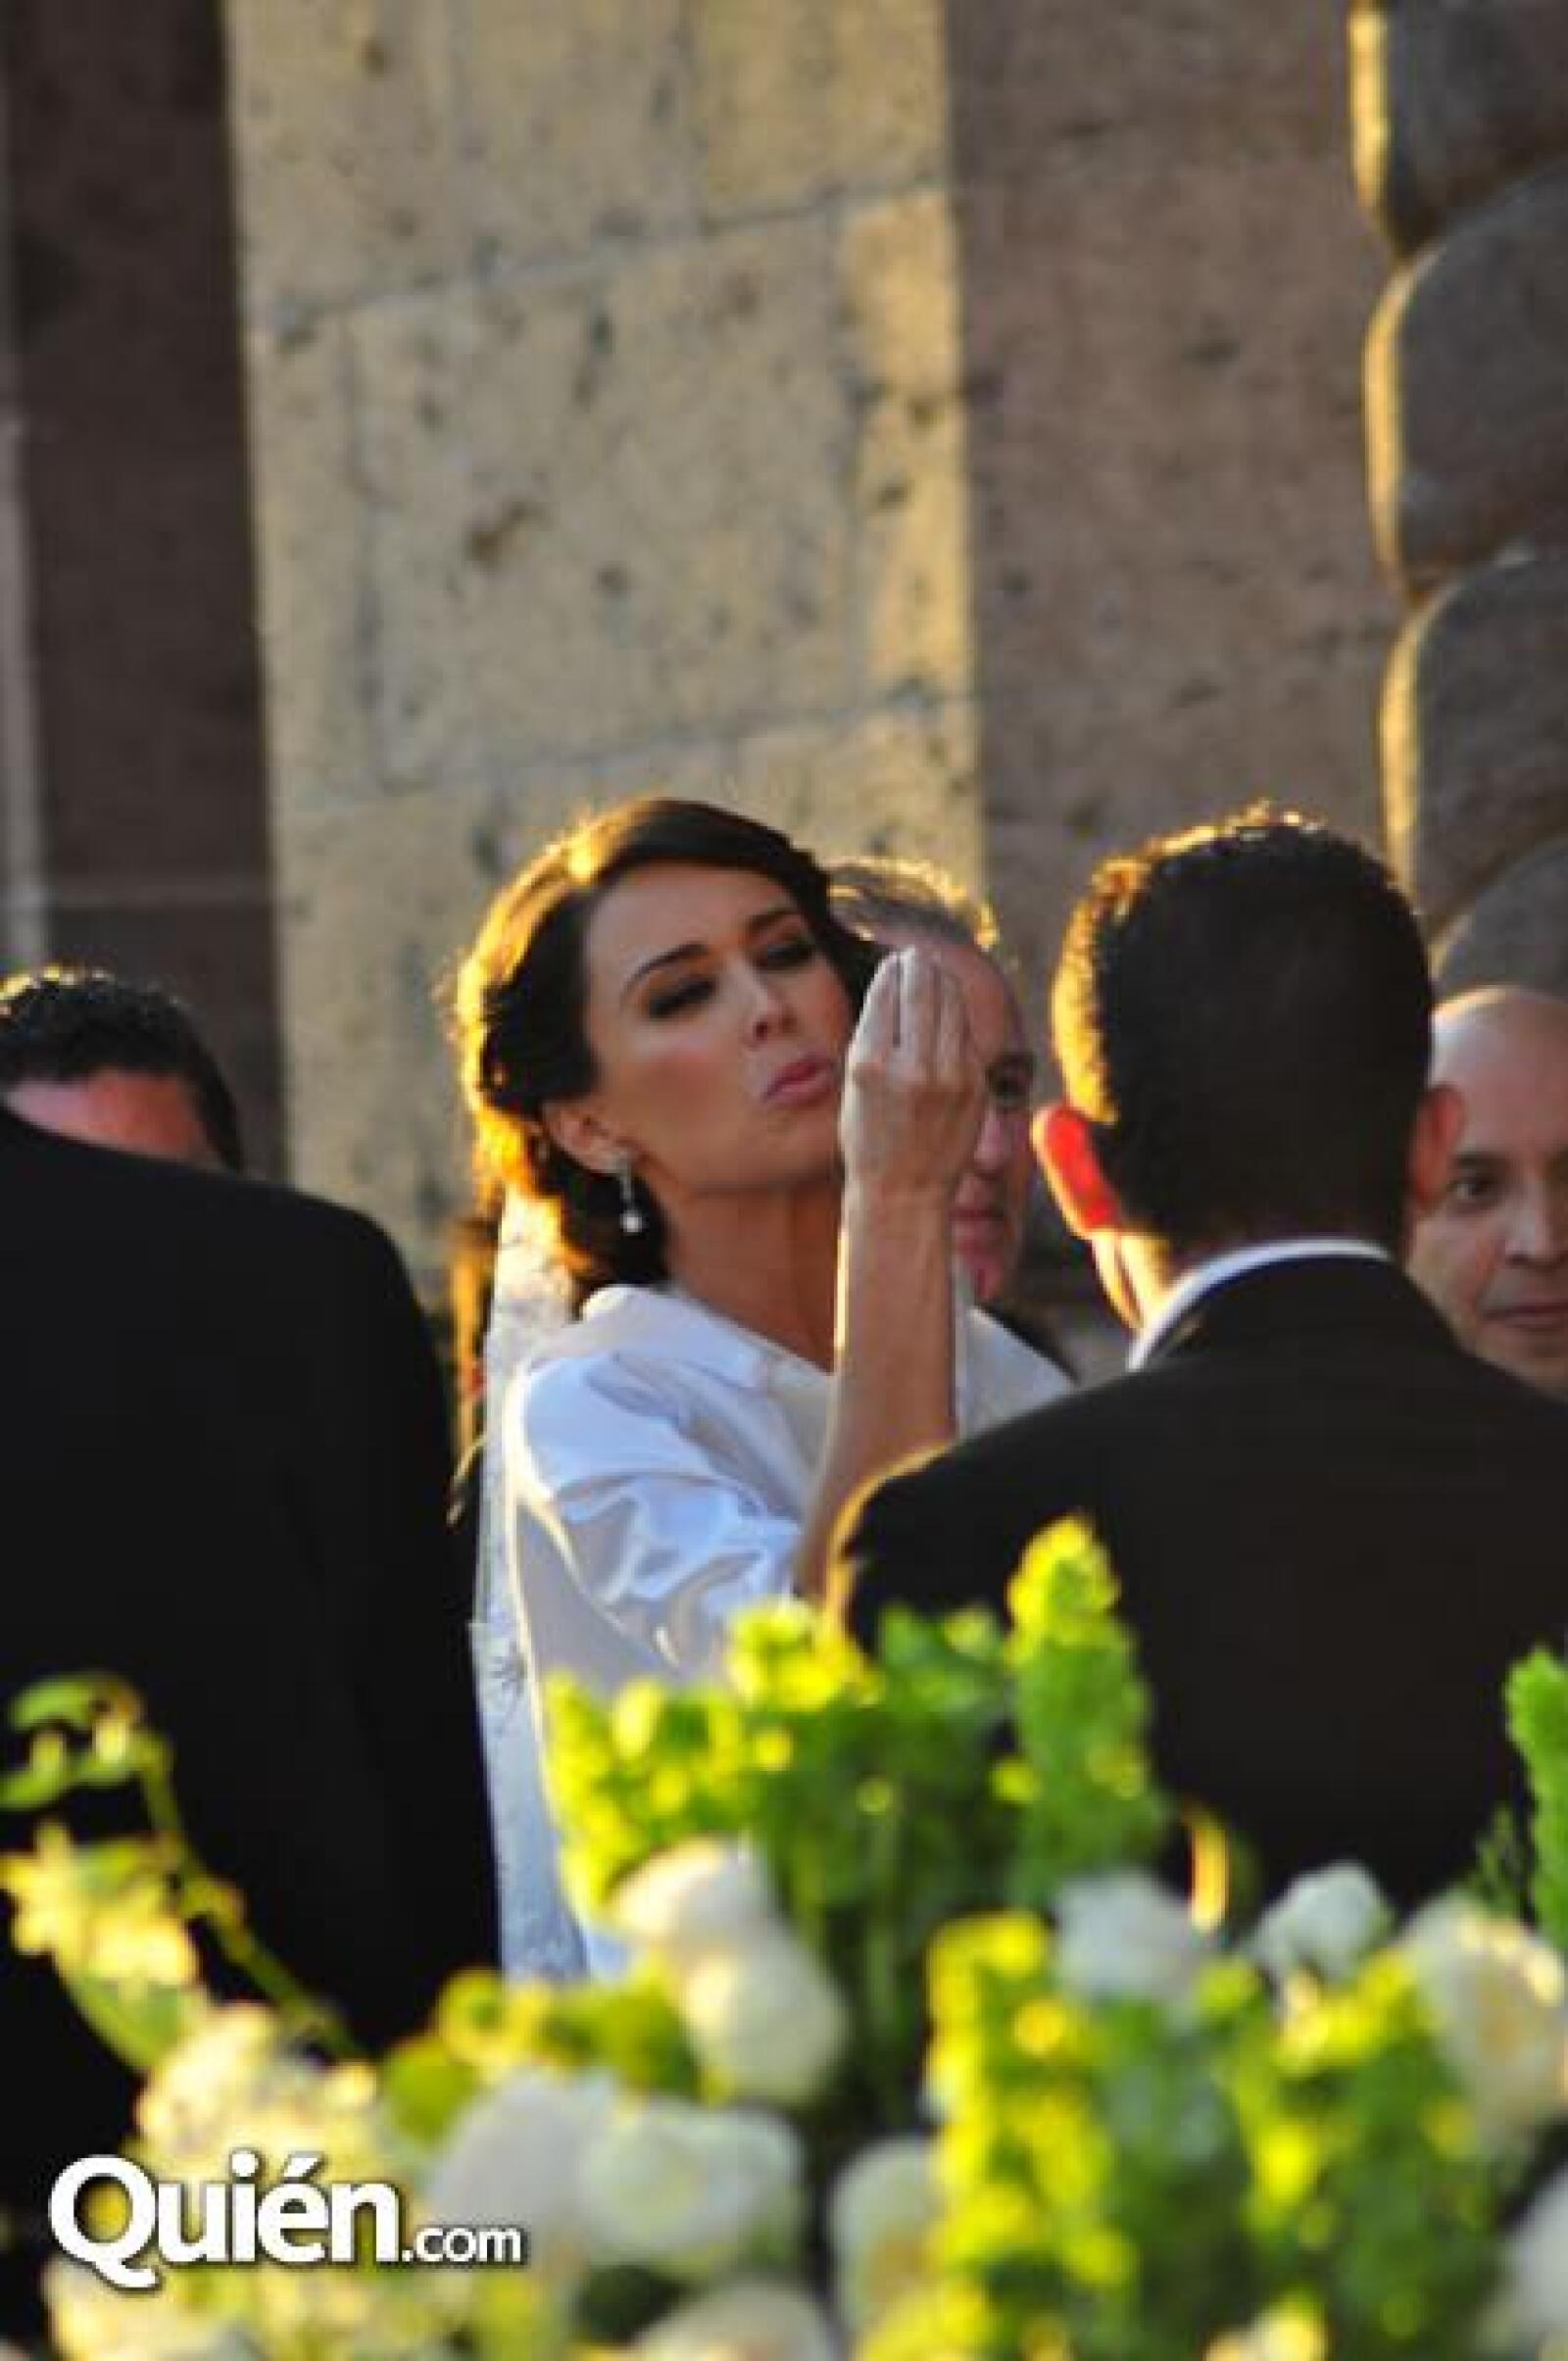 La novia llegando a la iglesia